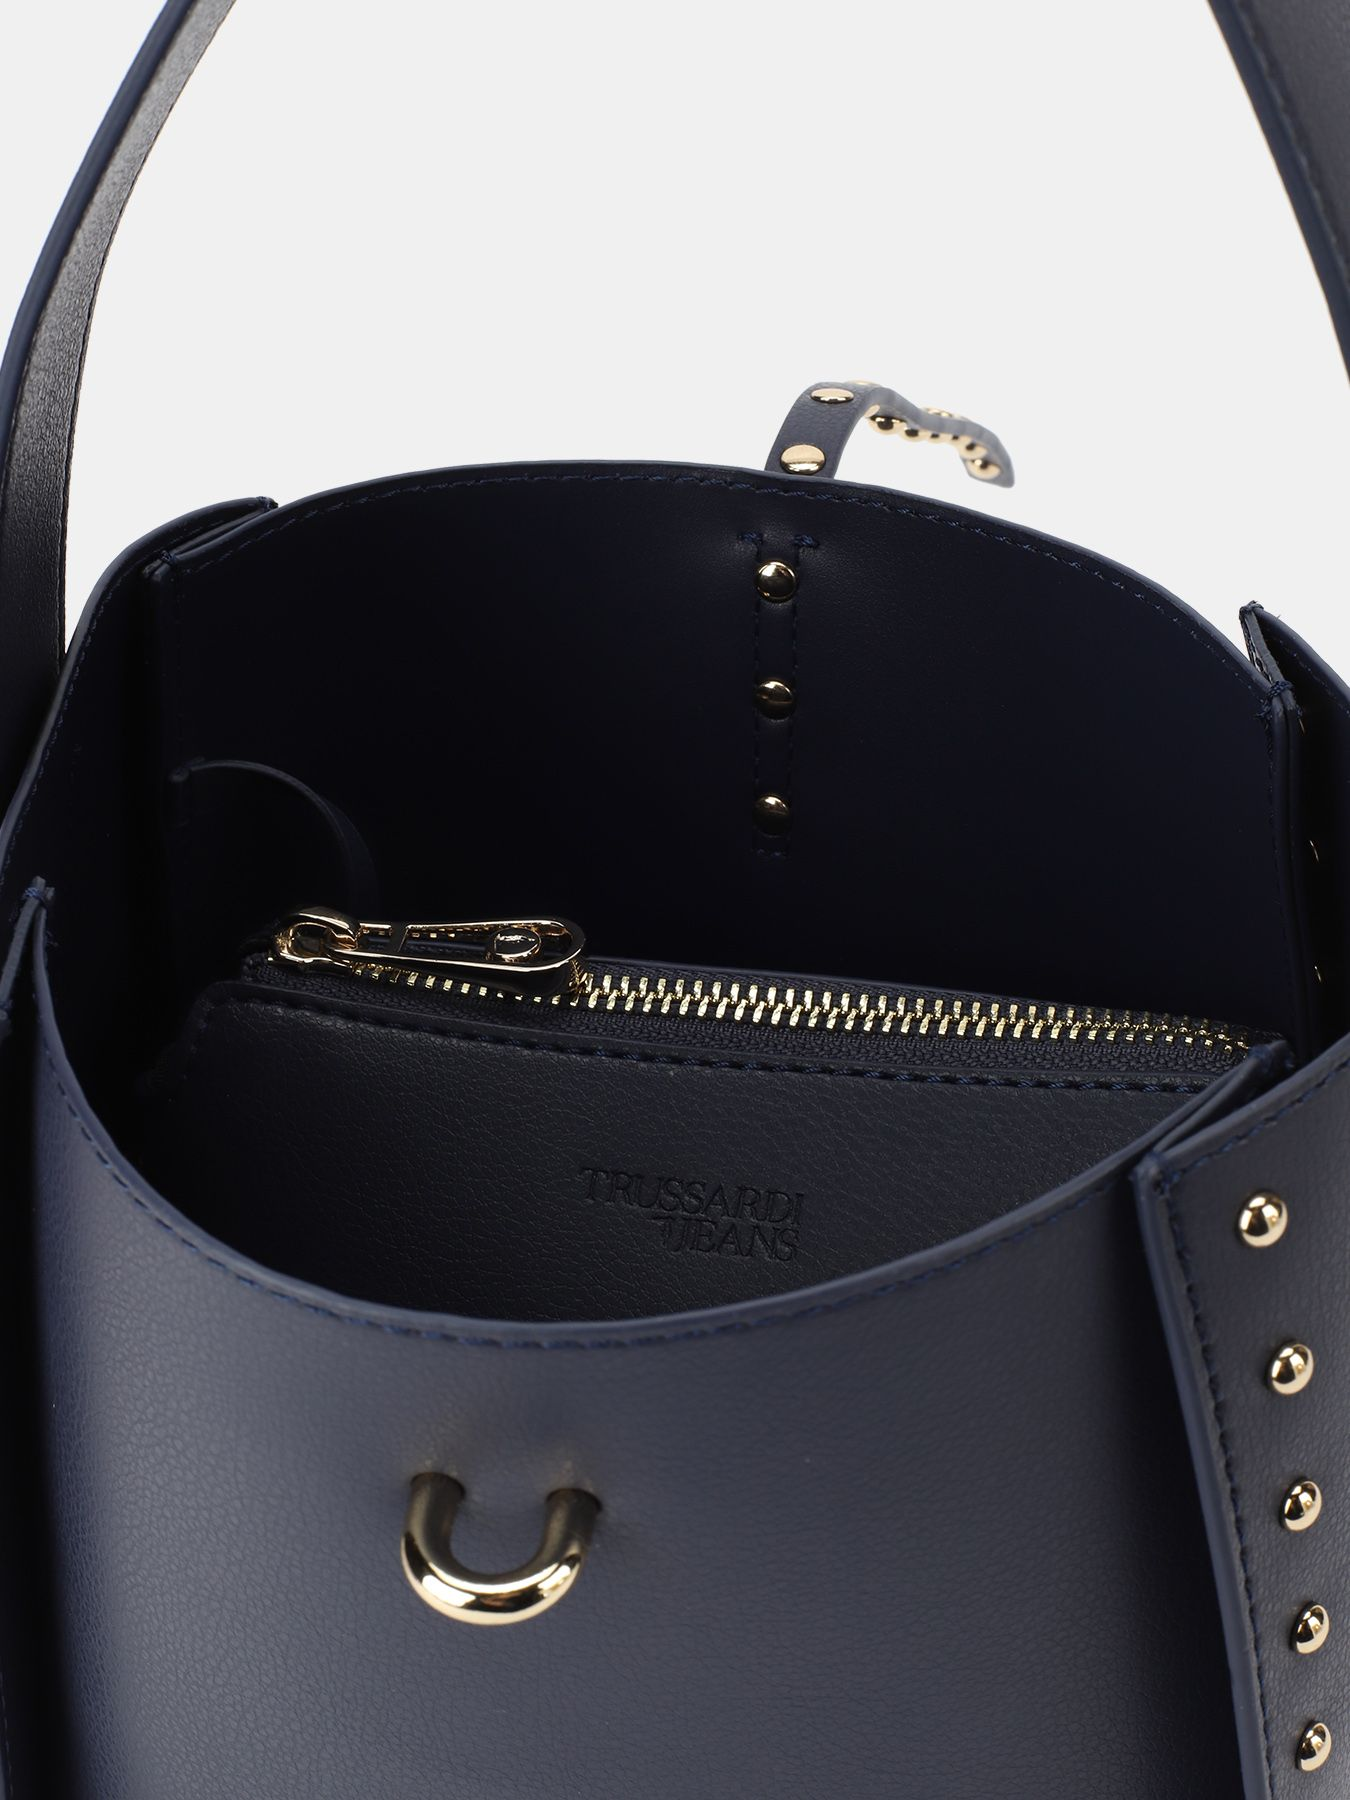 Trussardi Jeans Женская сумка 2 в 1 365205-185 Фото 3